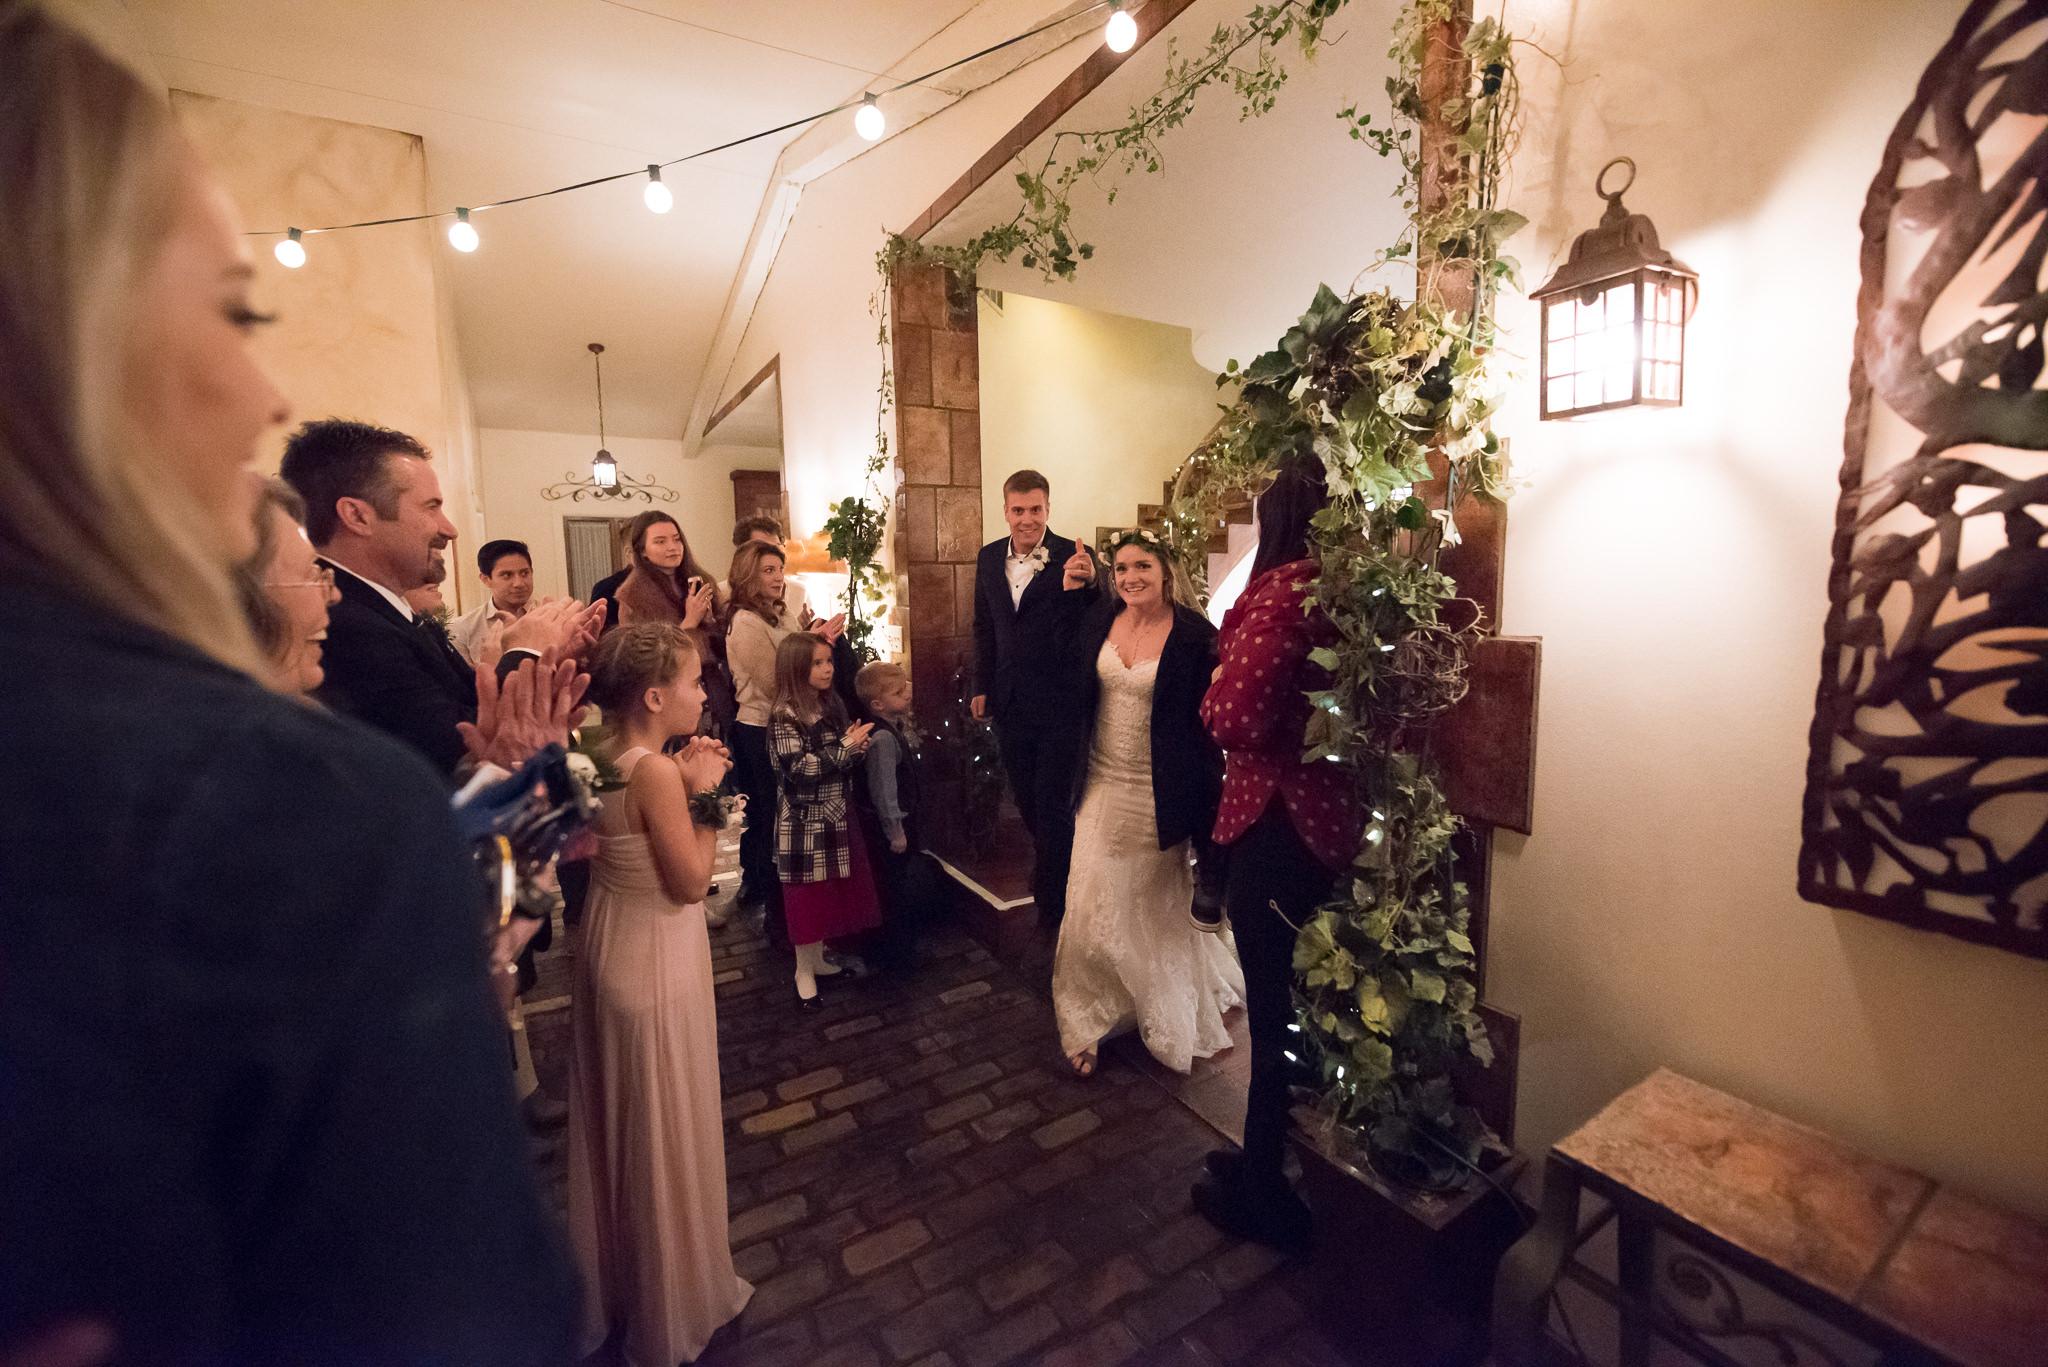 Trevor-Hooper-Wedding-Photographer-The-Bungalow-Wedding-Utah_CLR_079.jpg